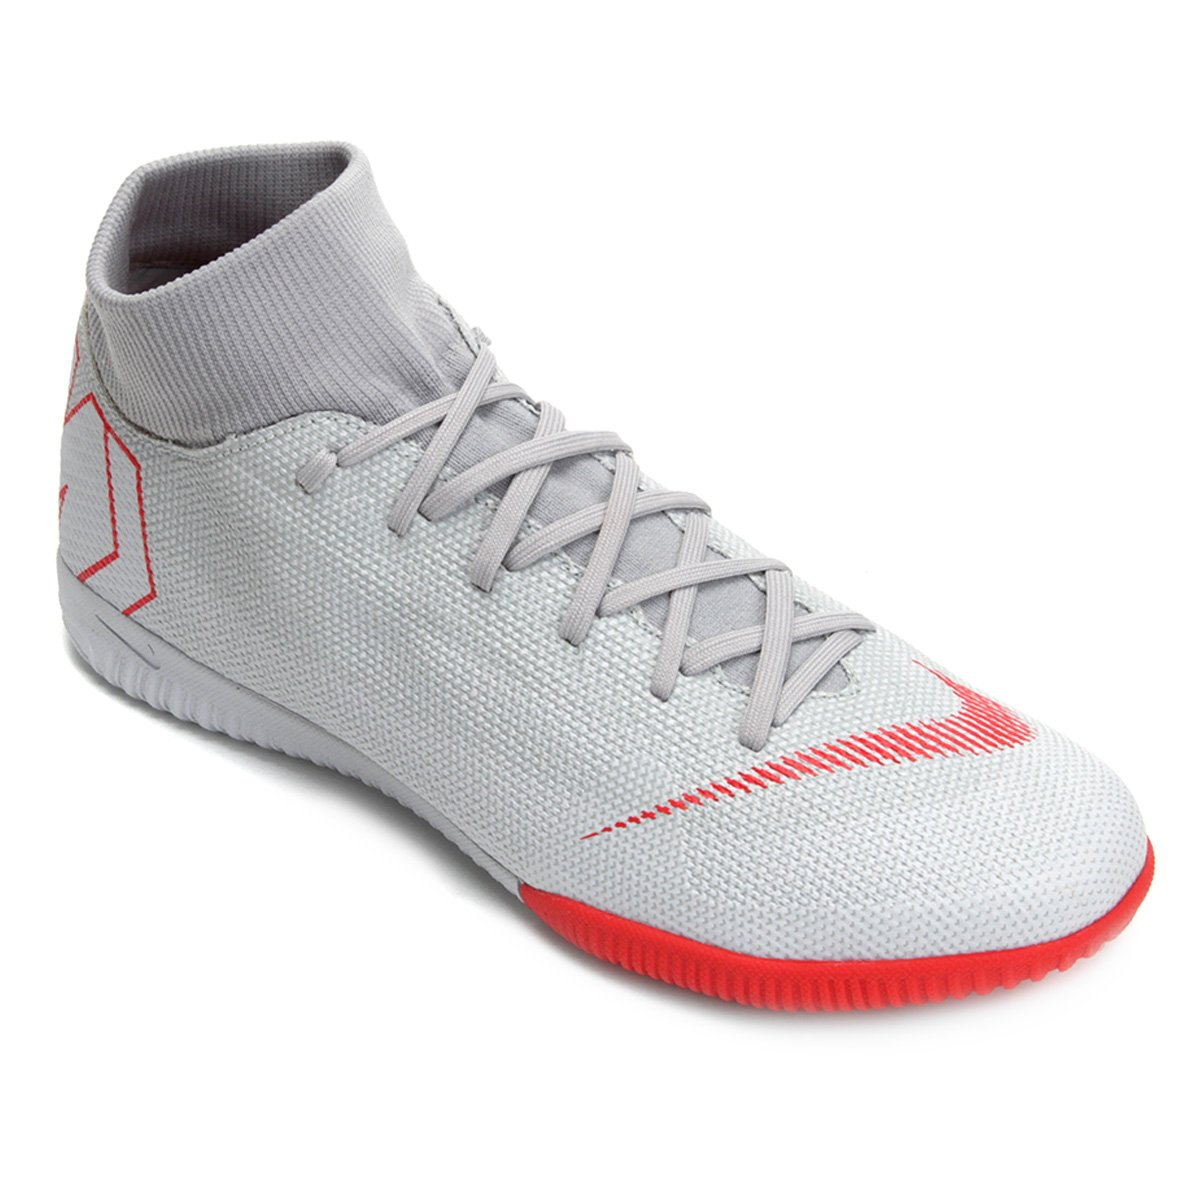 a8041e9ccc Chuteira Futsal Nike Mercurial Superfly 6 Academy - Cinza - Compre ...